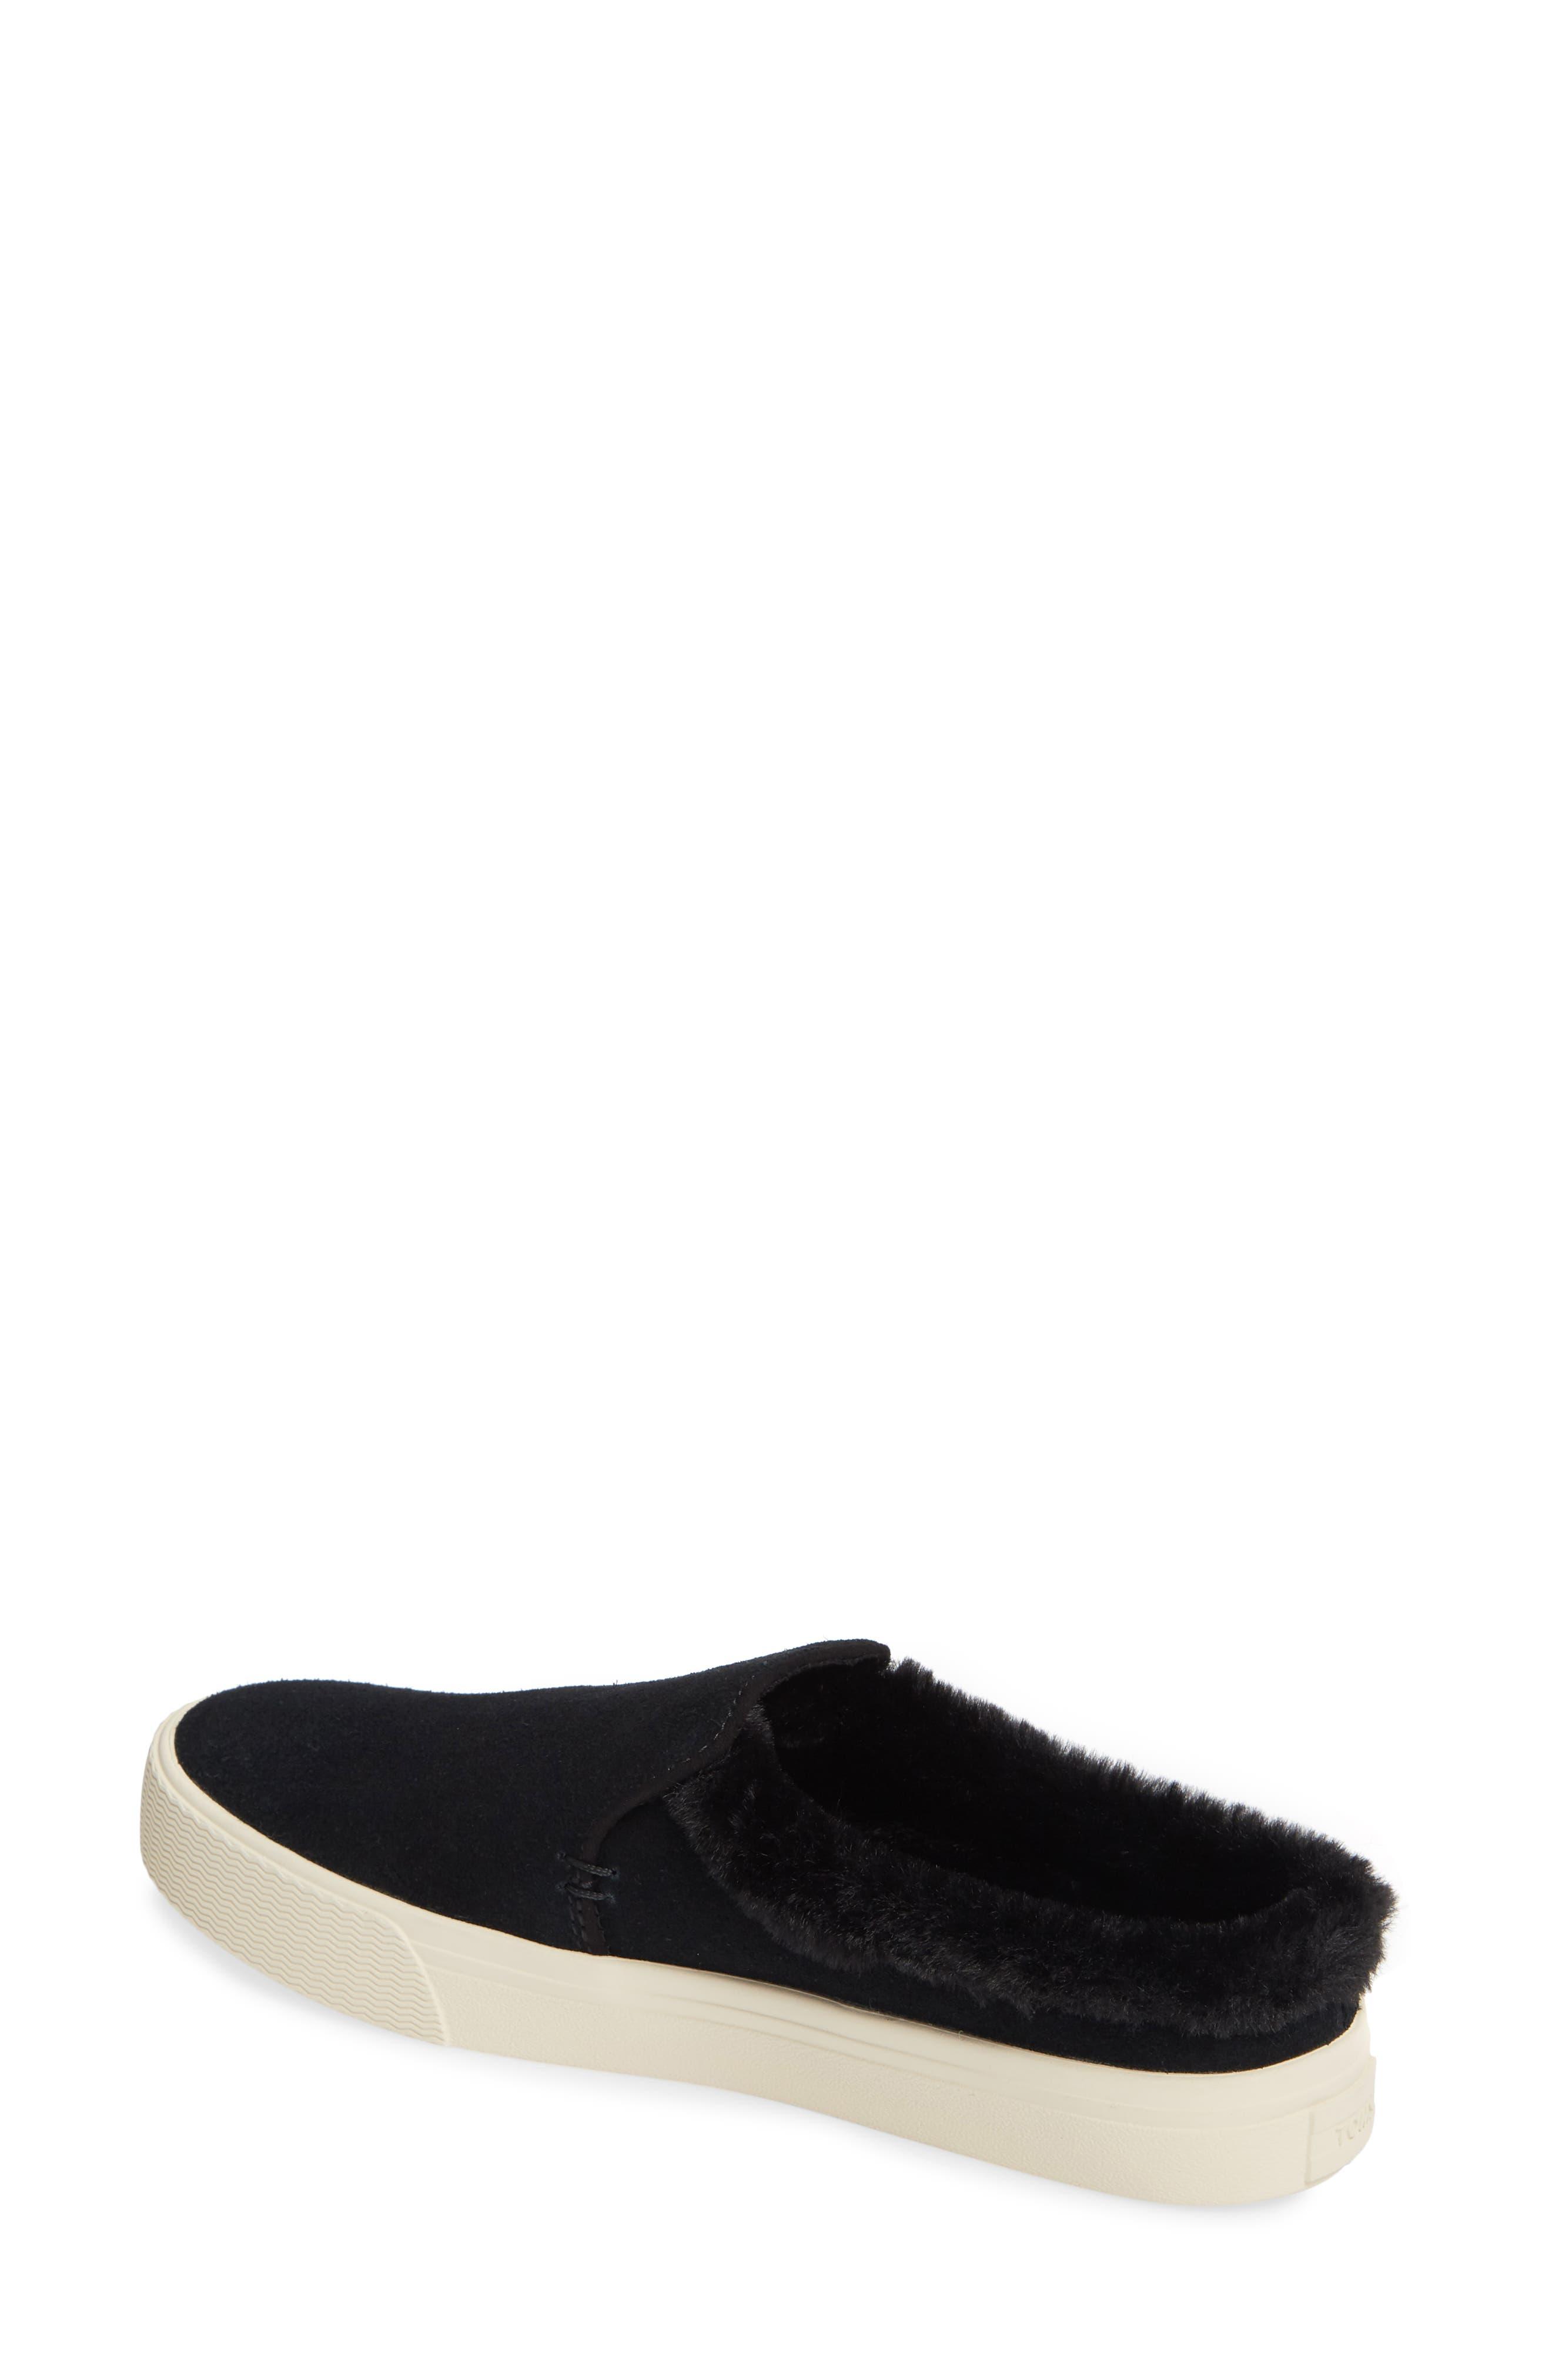 TOMS, Sunrise Faux Fur Lined Slip-On Sneaker, Alternate thumbnail 2, color, BLACK SUEDE